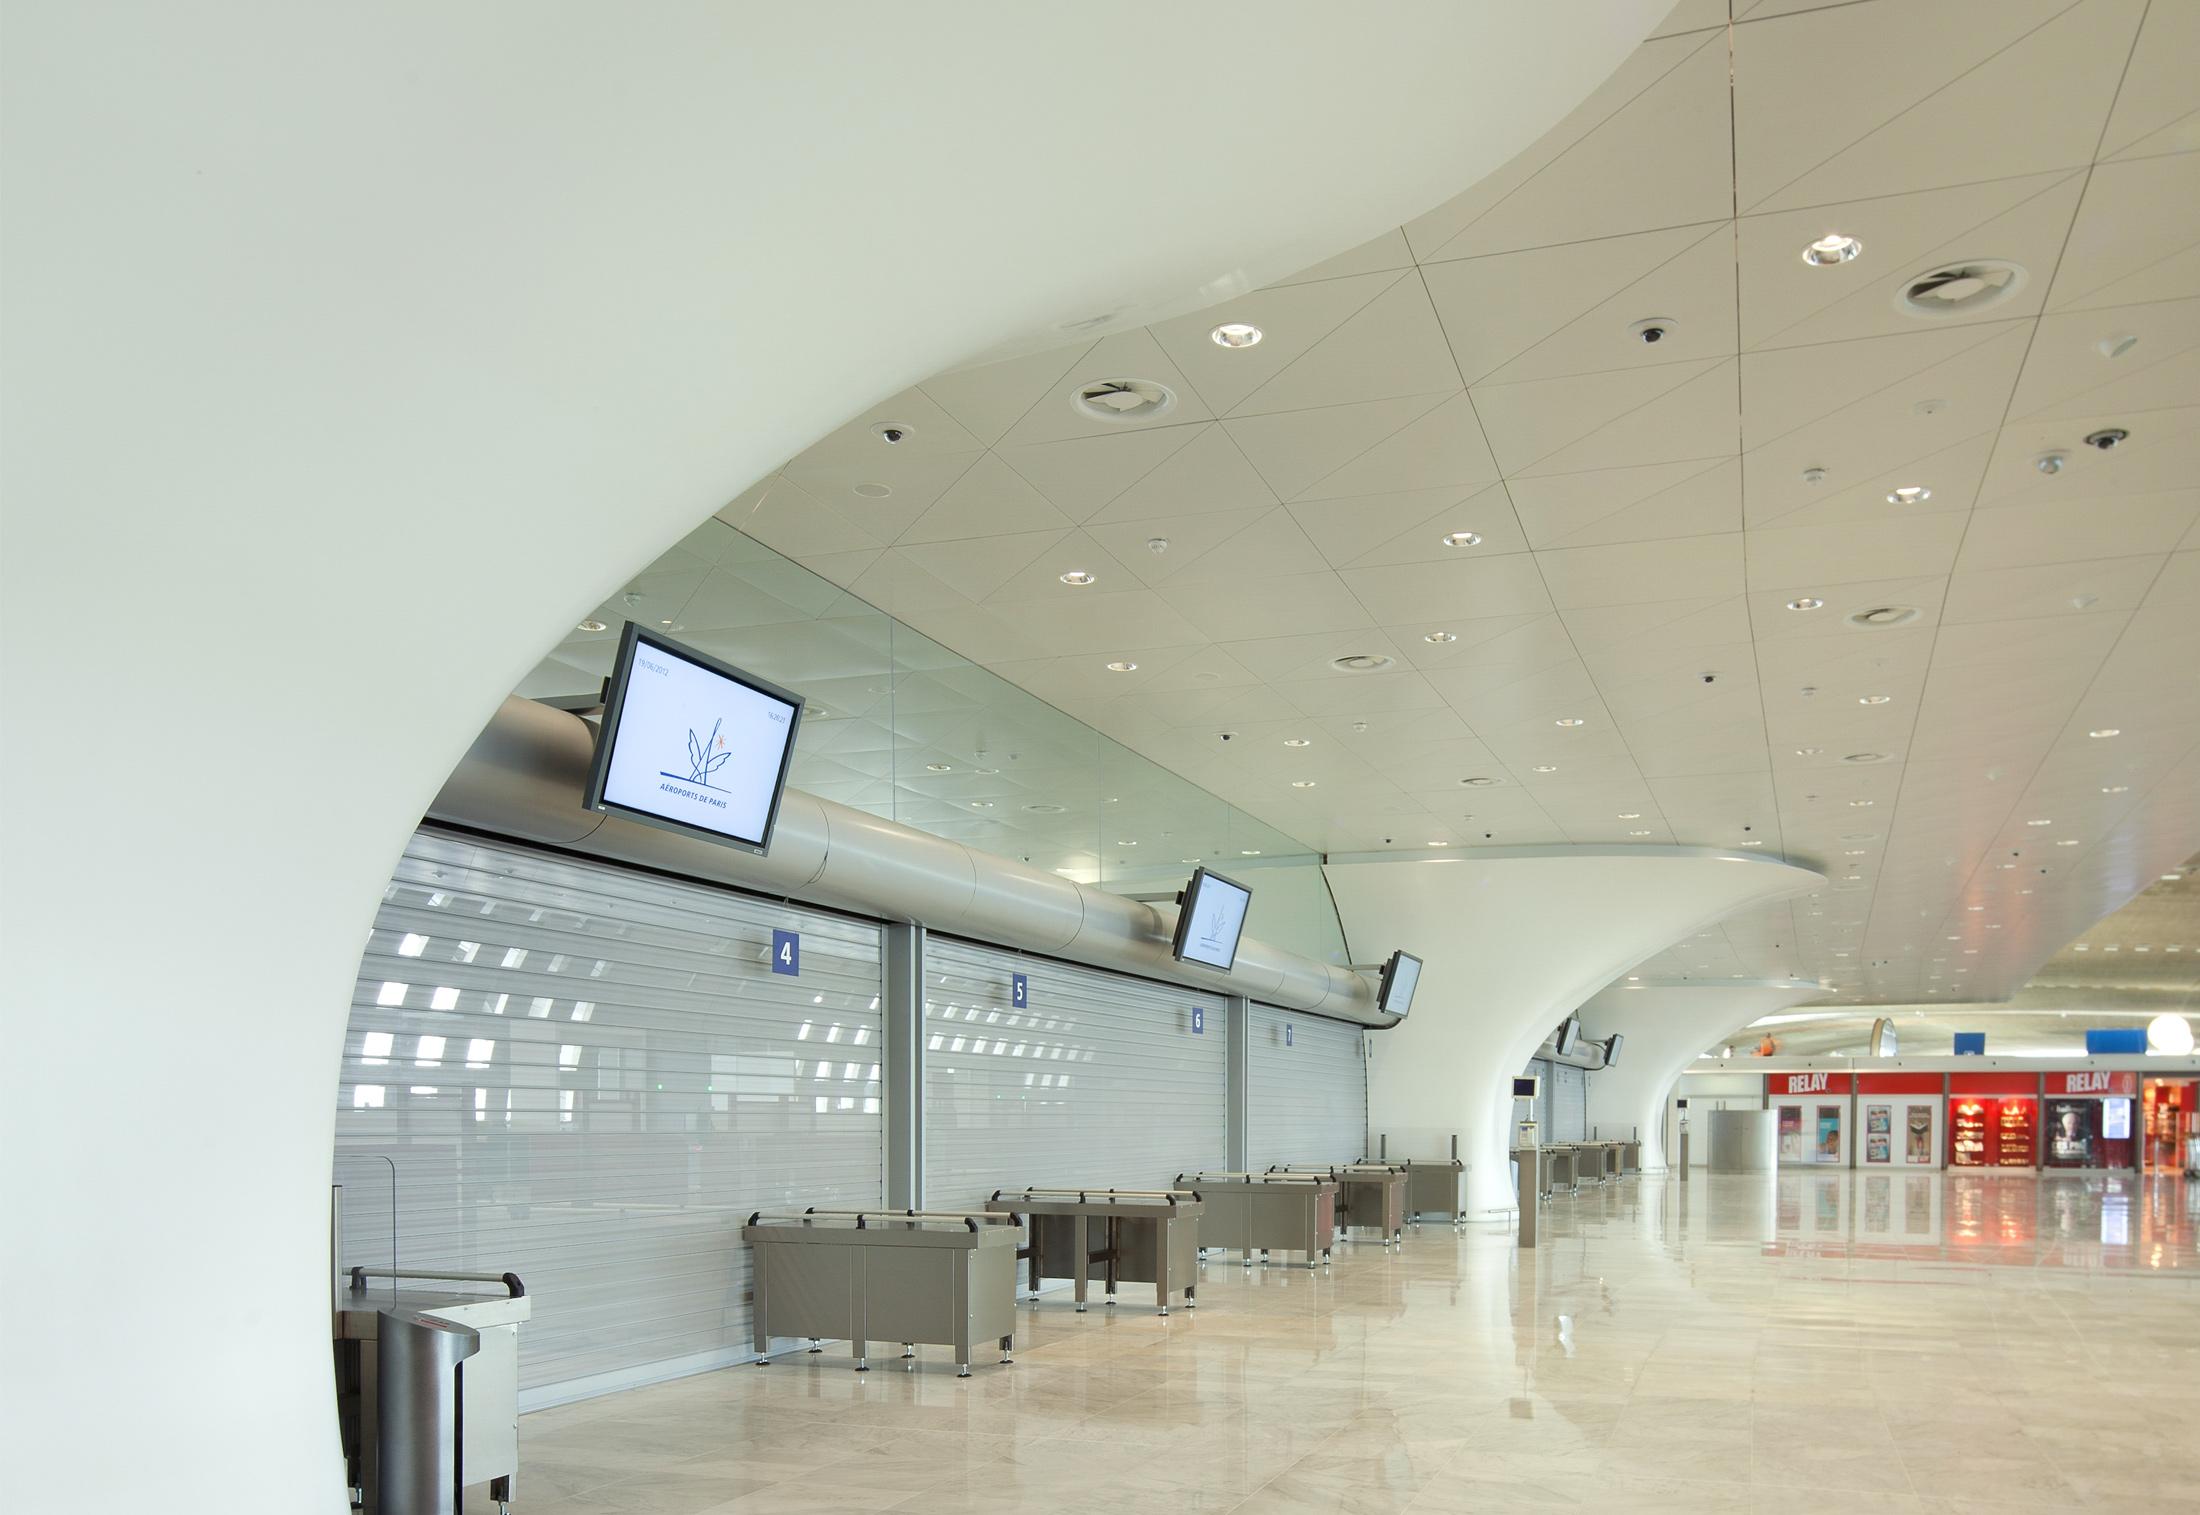 Clads Terminal 2f Charles De Gaulle Airport Paris By Hi